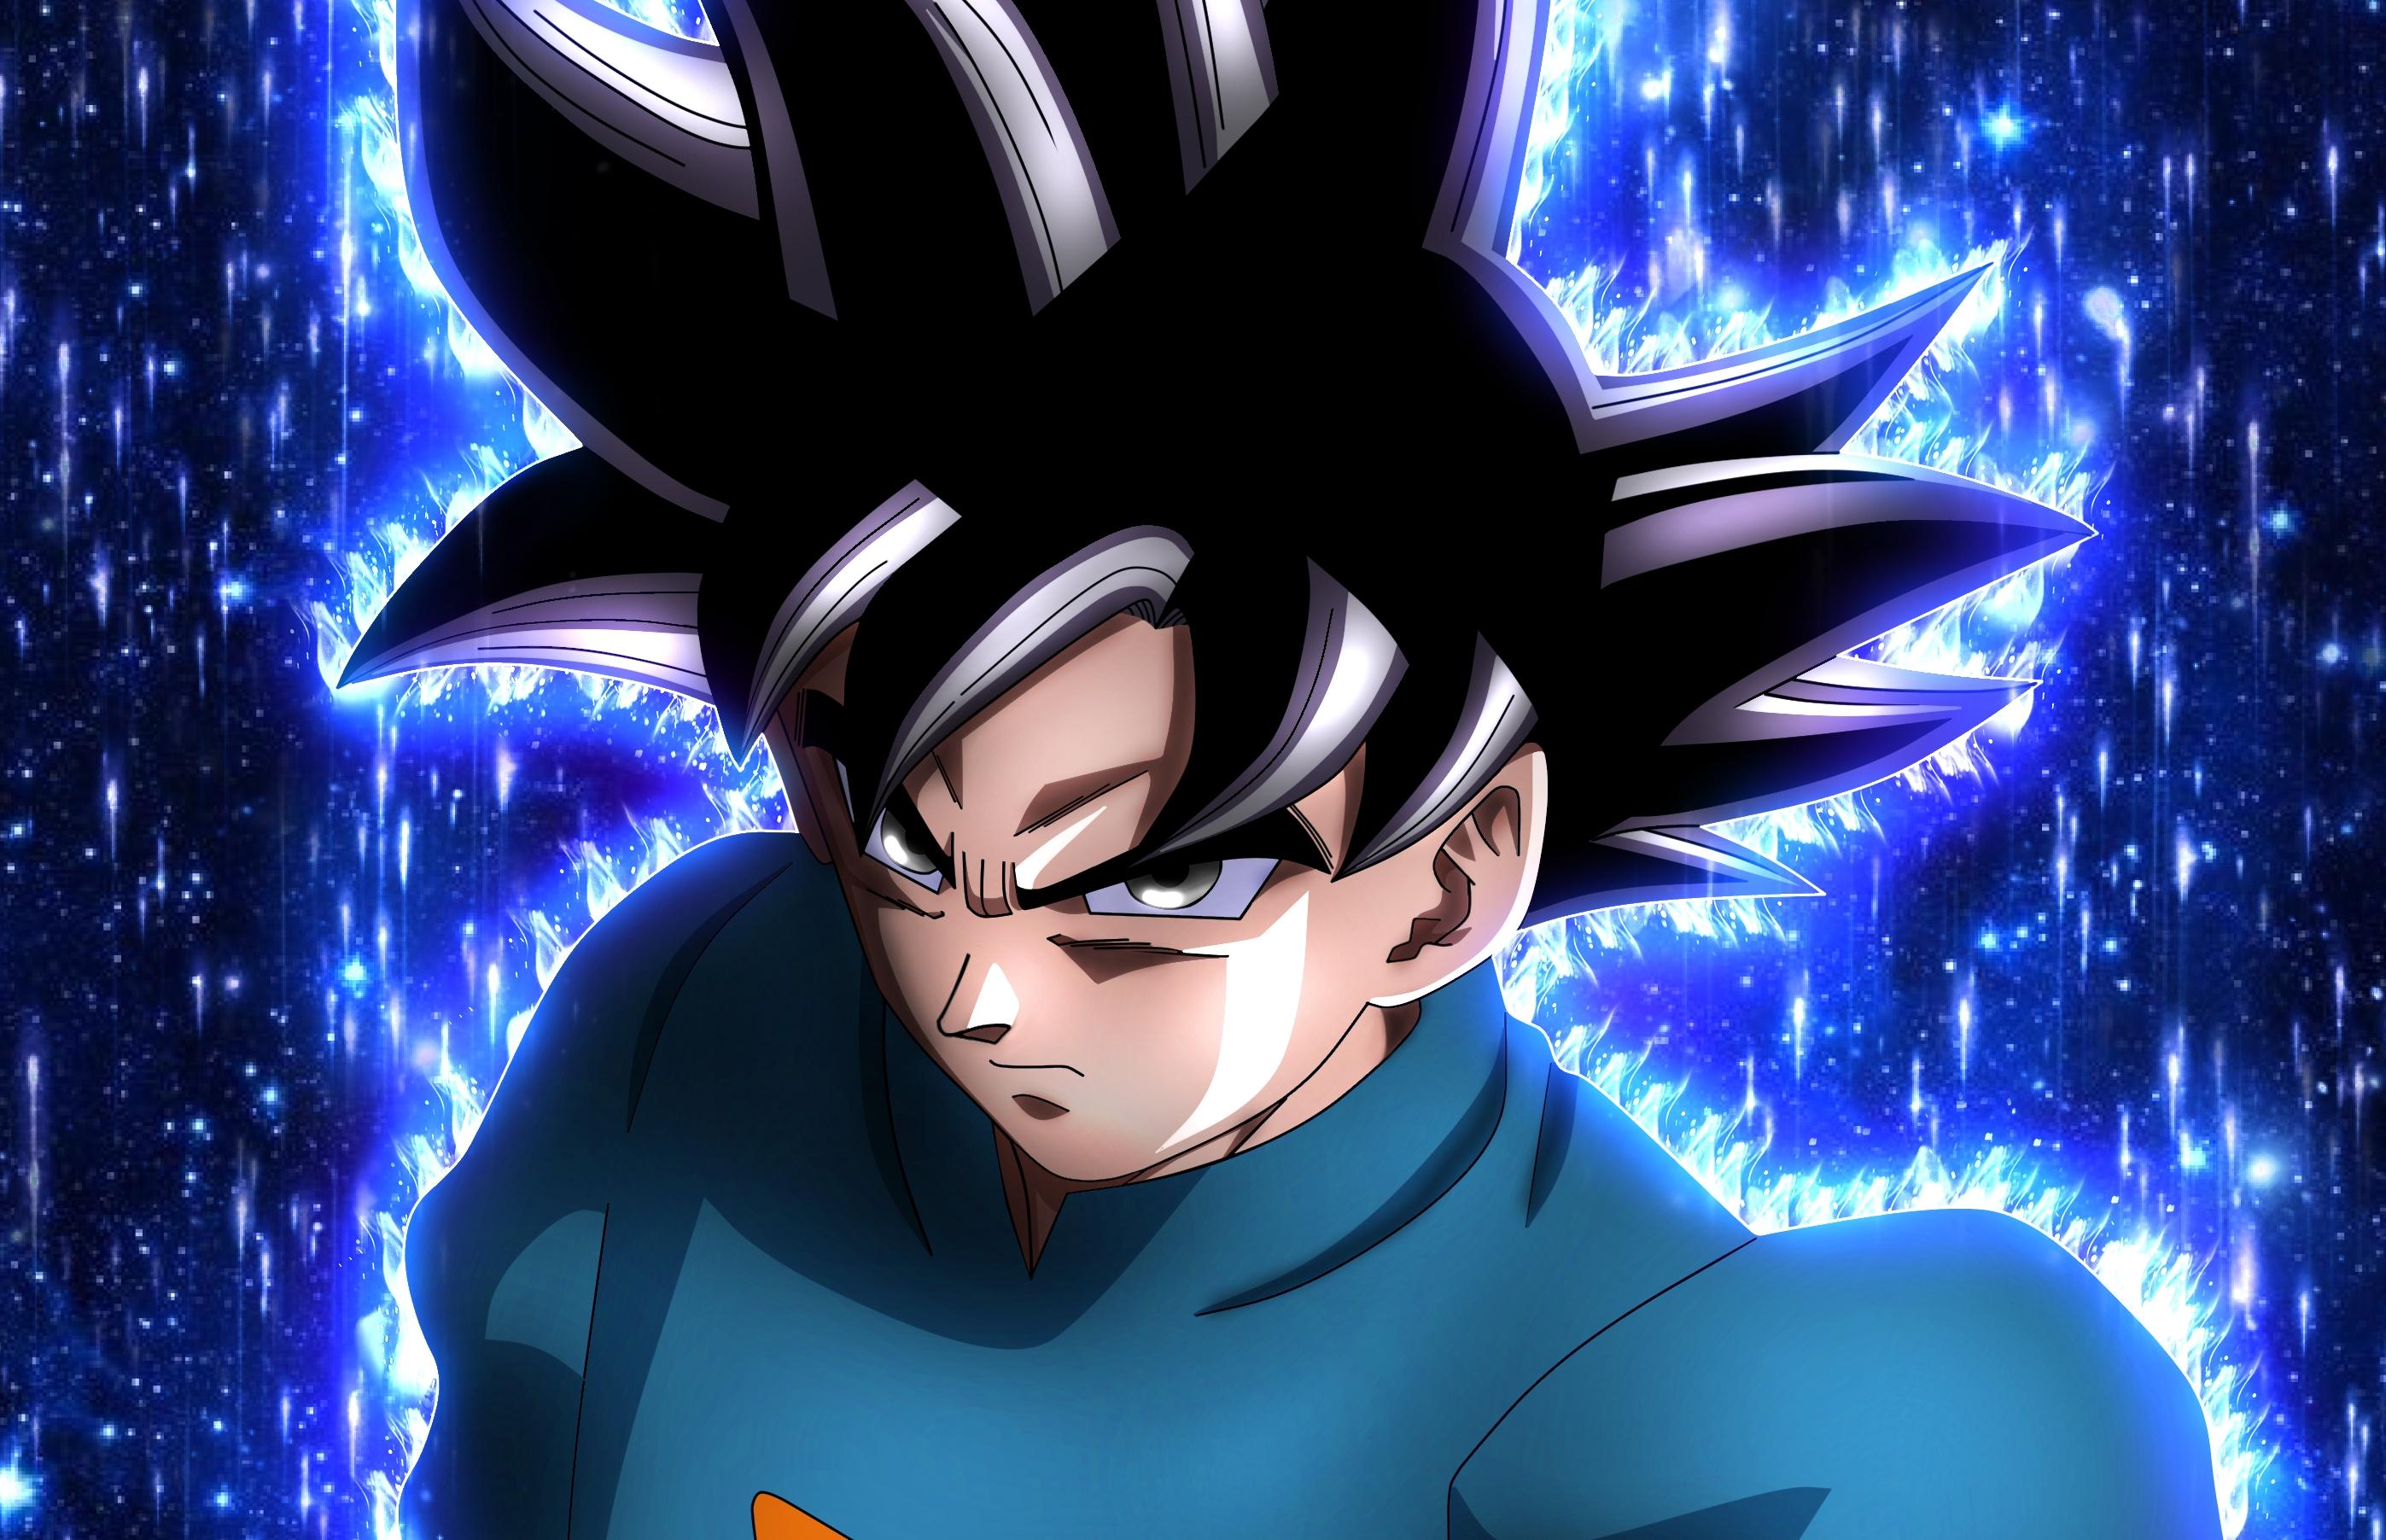 Goku Grand Master Hd Wallpaper Background Image